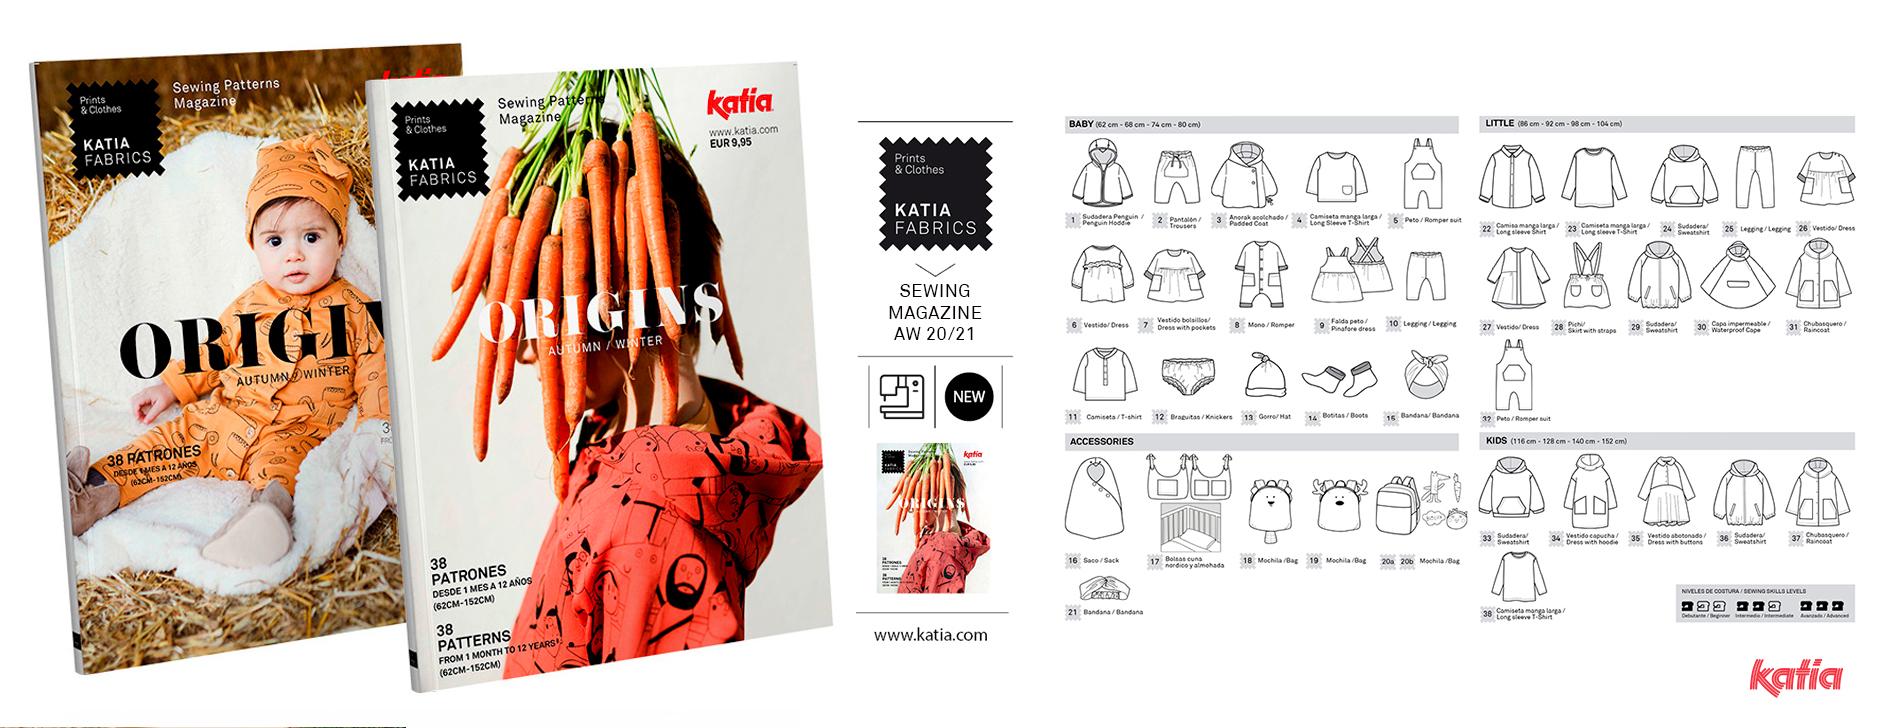 Katia Fabrics sewing magazine